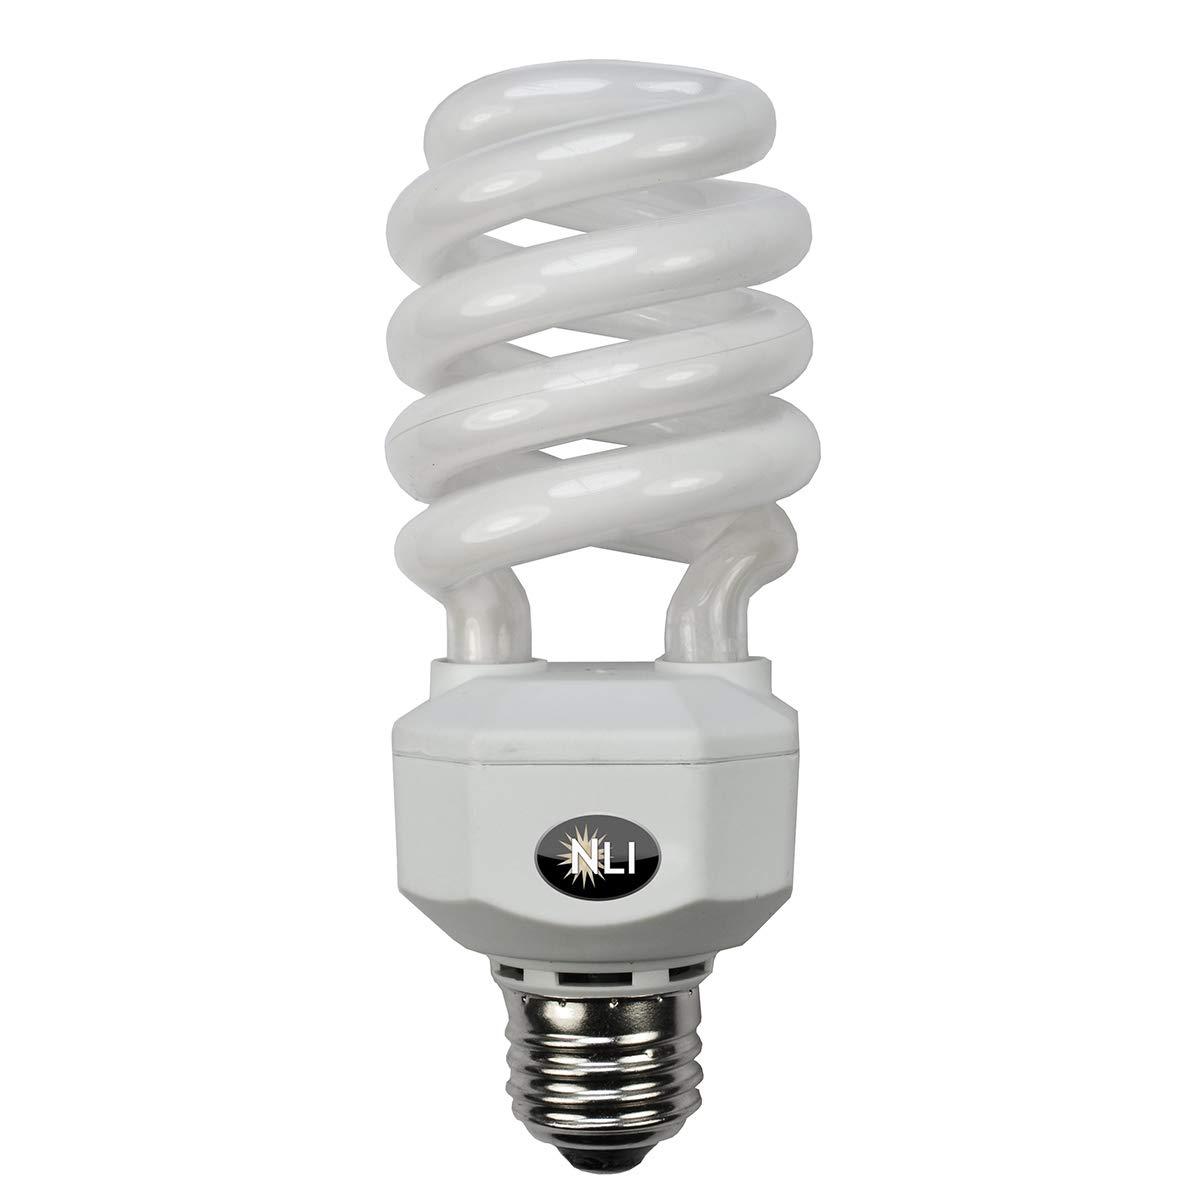 Norman Lamps CFL26/UV/MED Germicidal UV Compact Germicidal Bulb, 120V, 26W